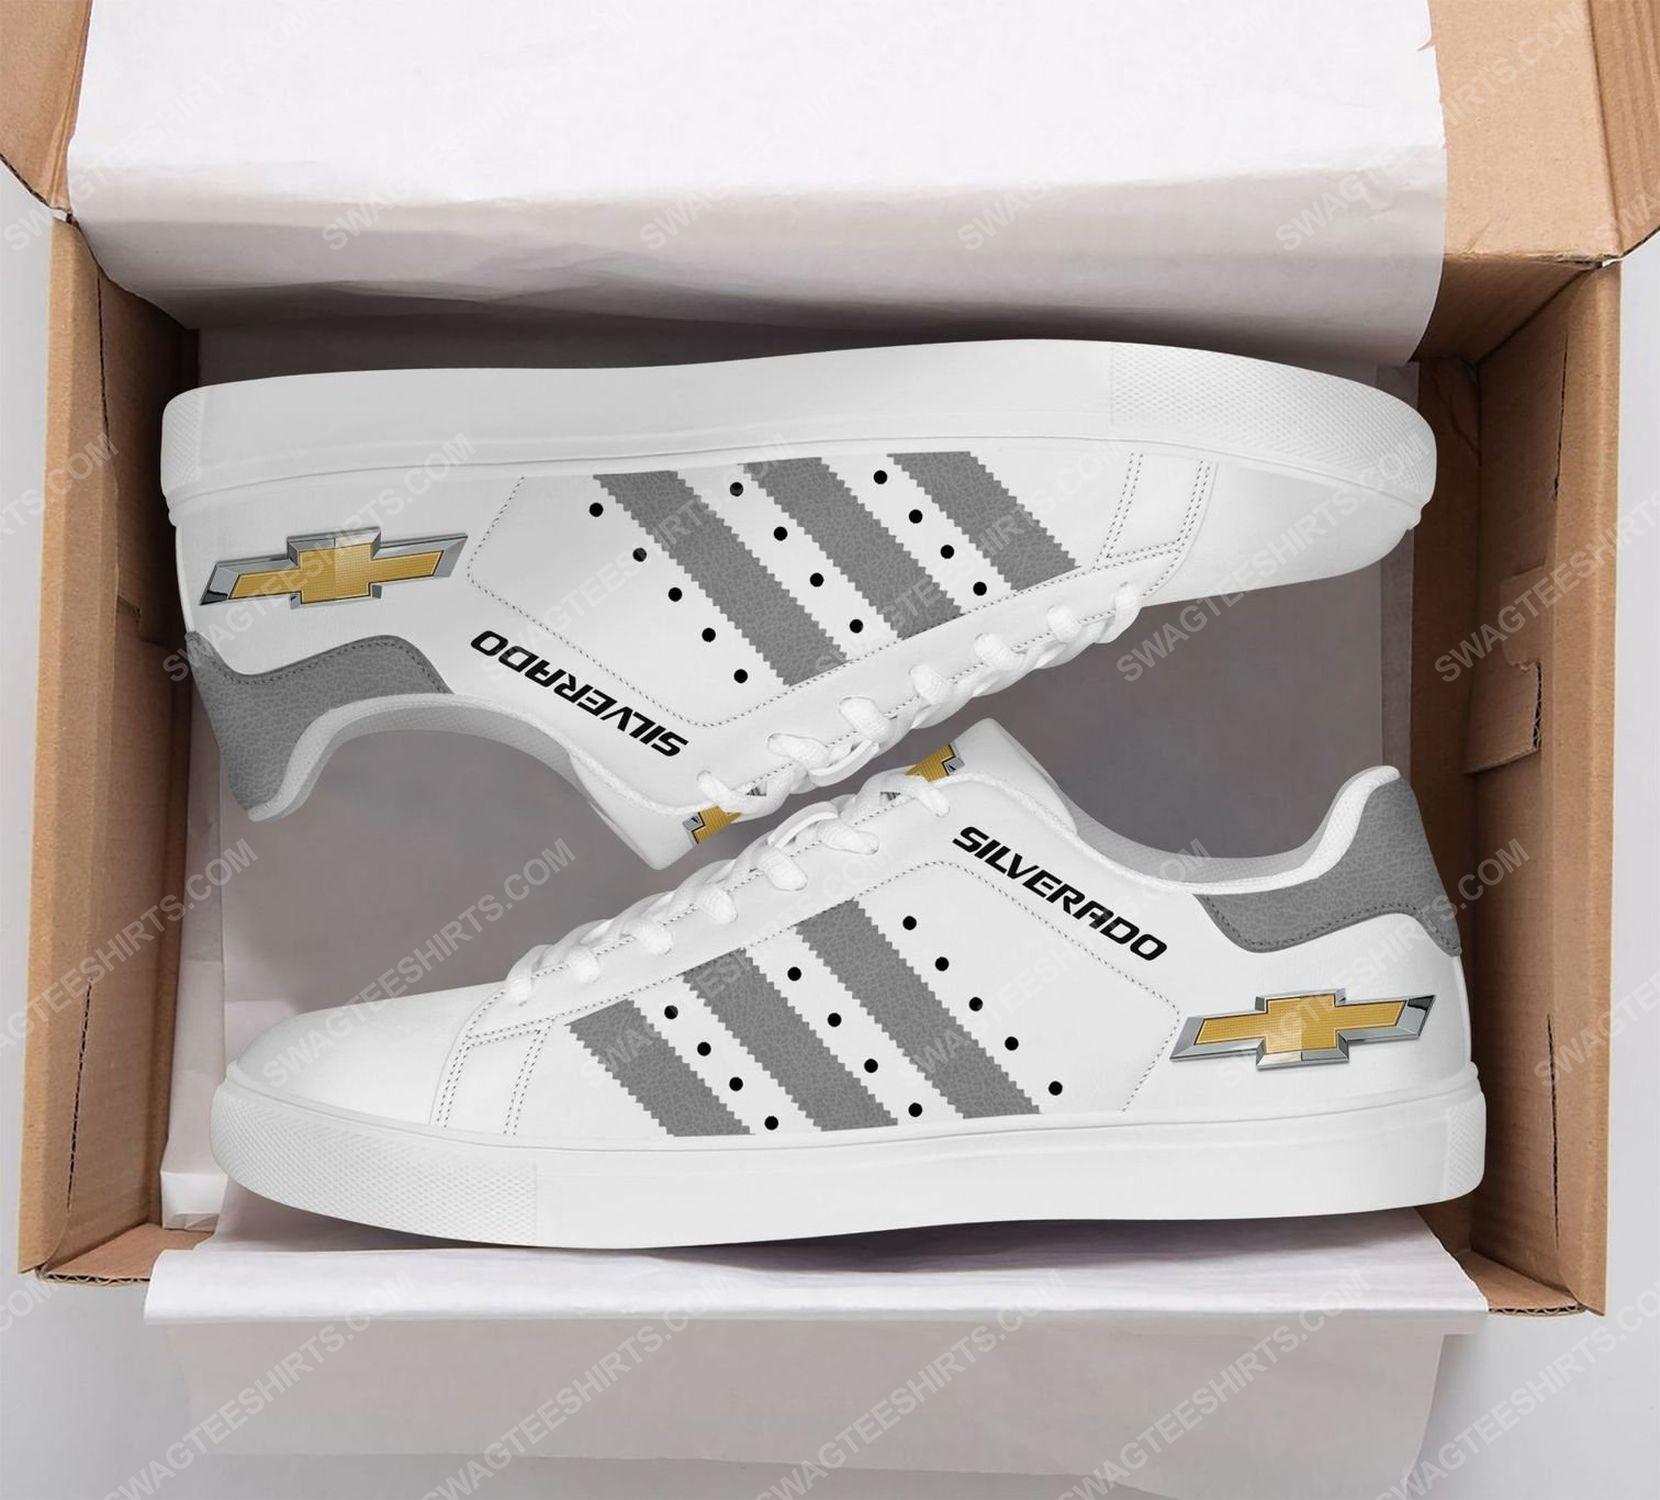 Chevrolet corvette version grey stan smith shoes 2